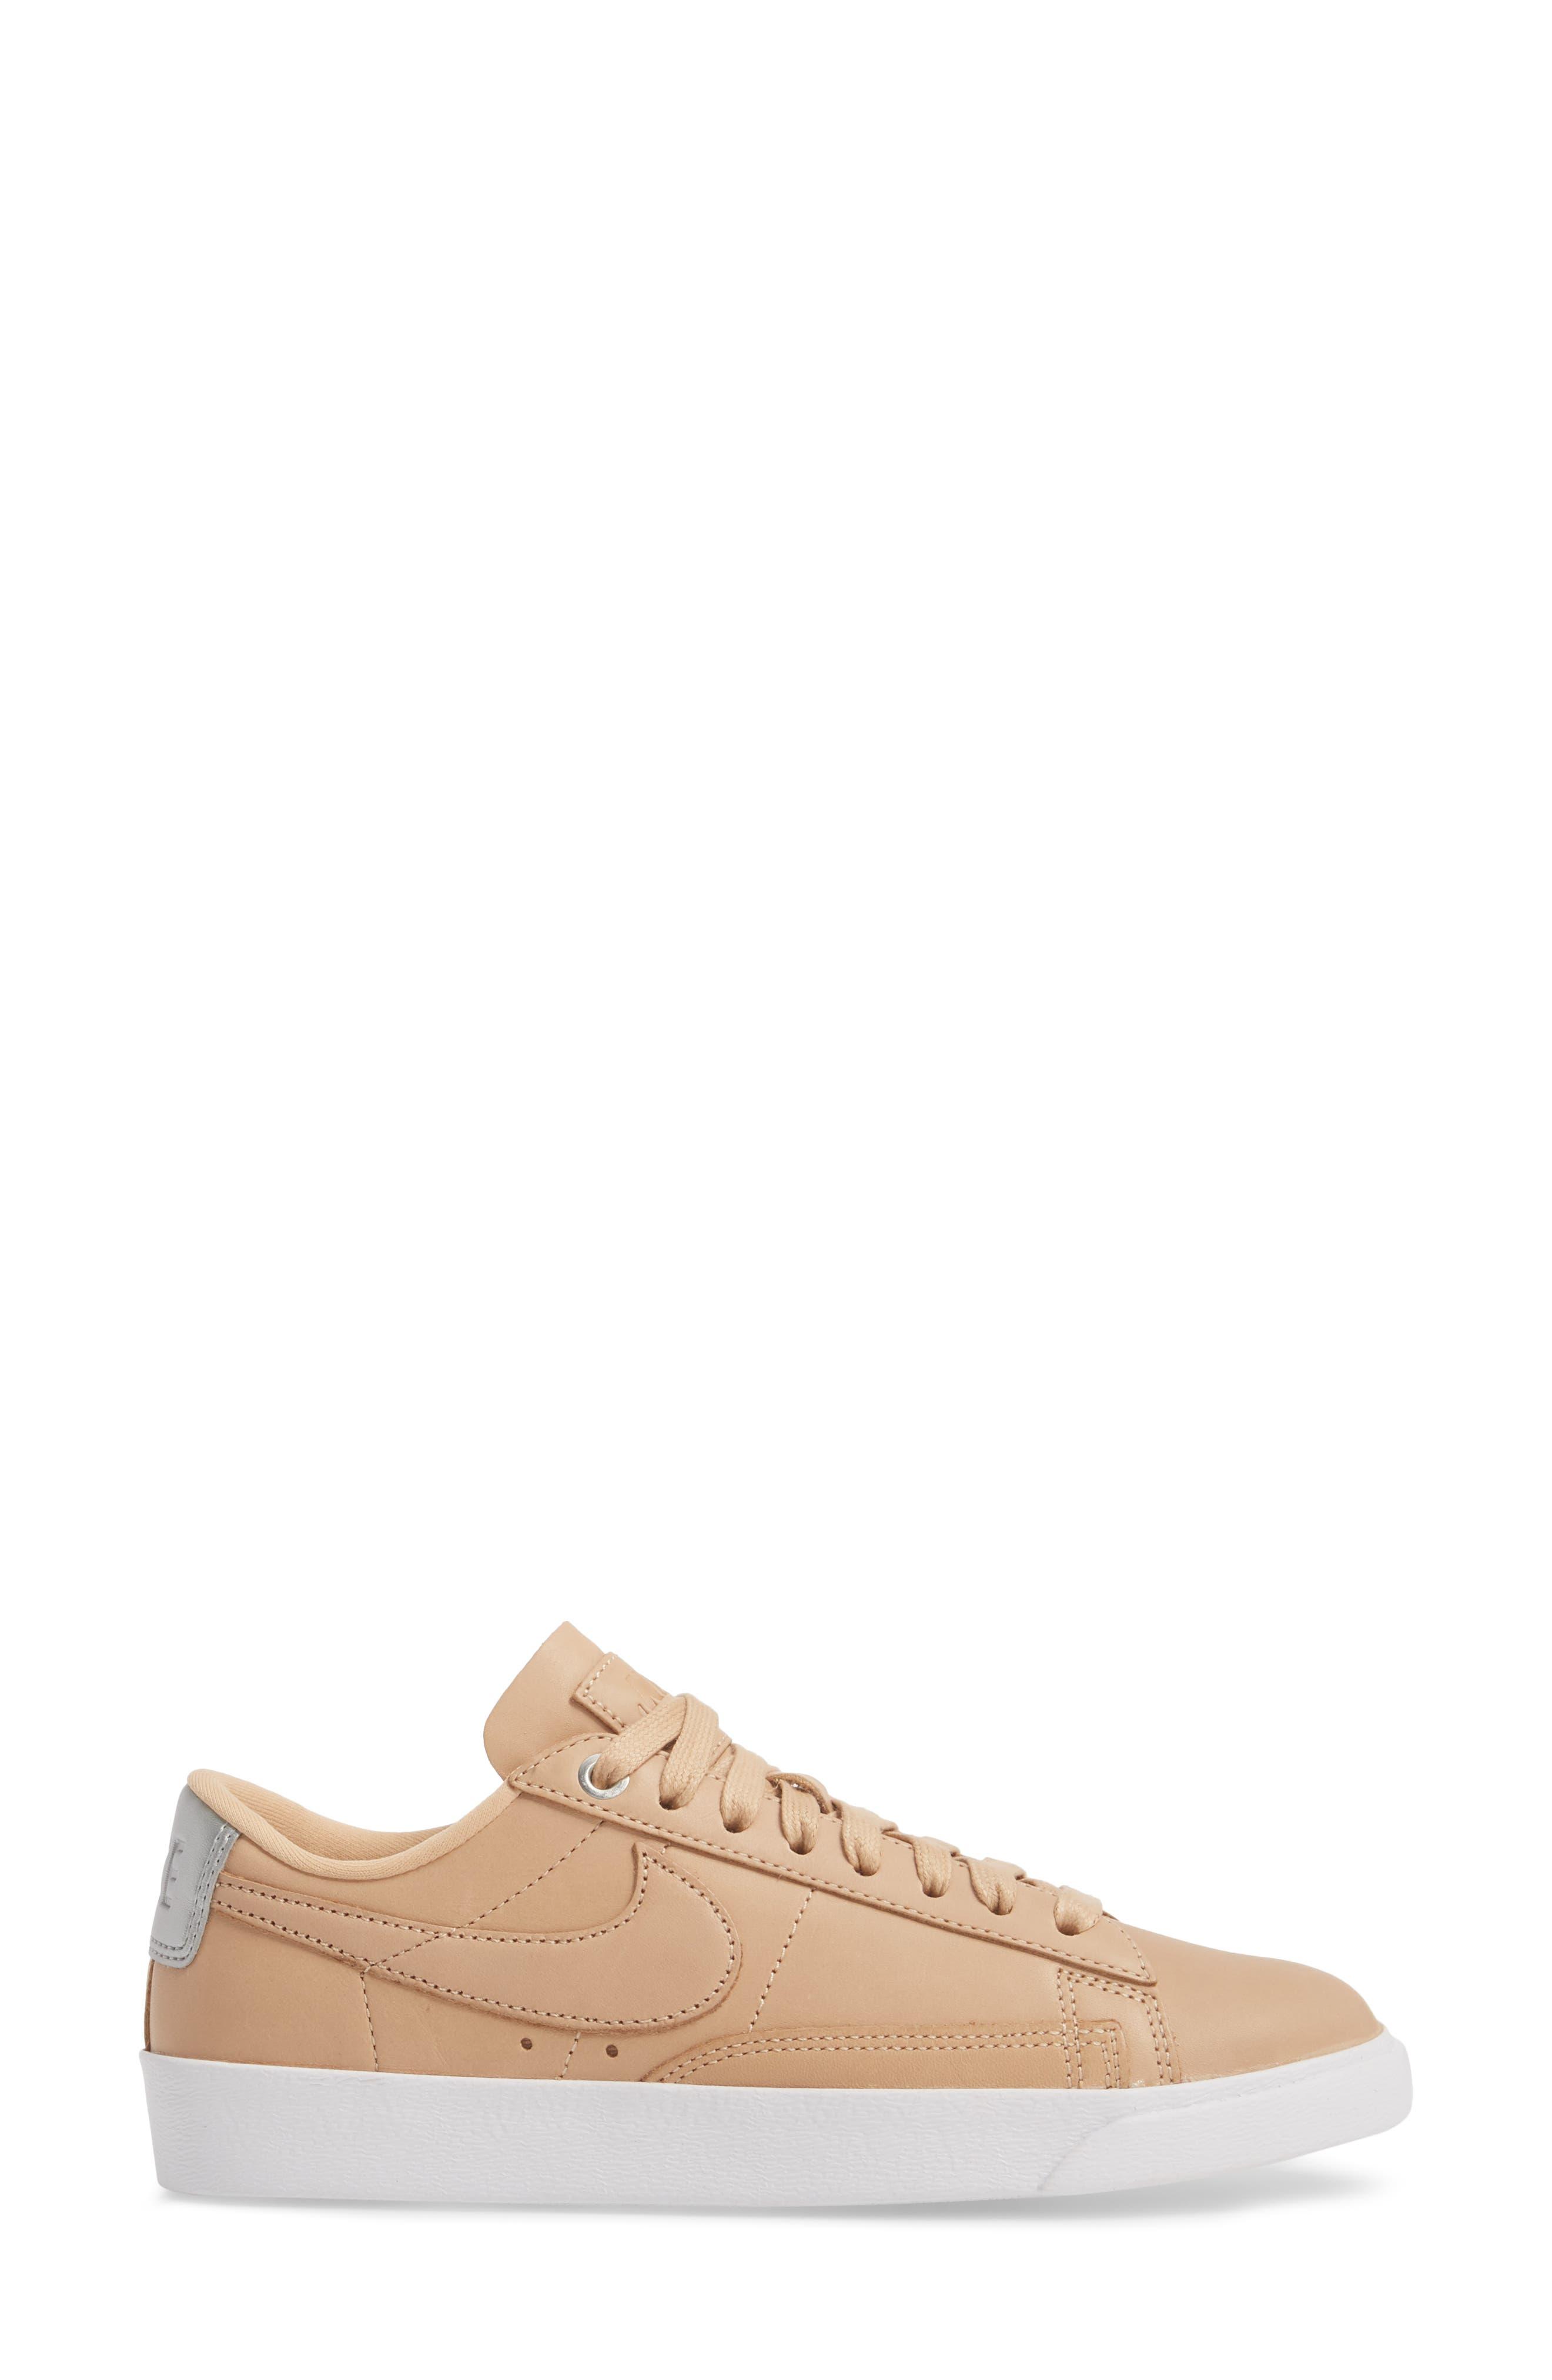 Blazer Low Top Sneaker SE,                             Alternate thumbnail 3, color,                             BIO BEIGE/ BIO BEIGE